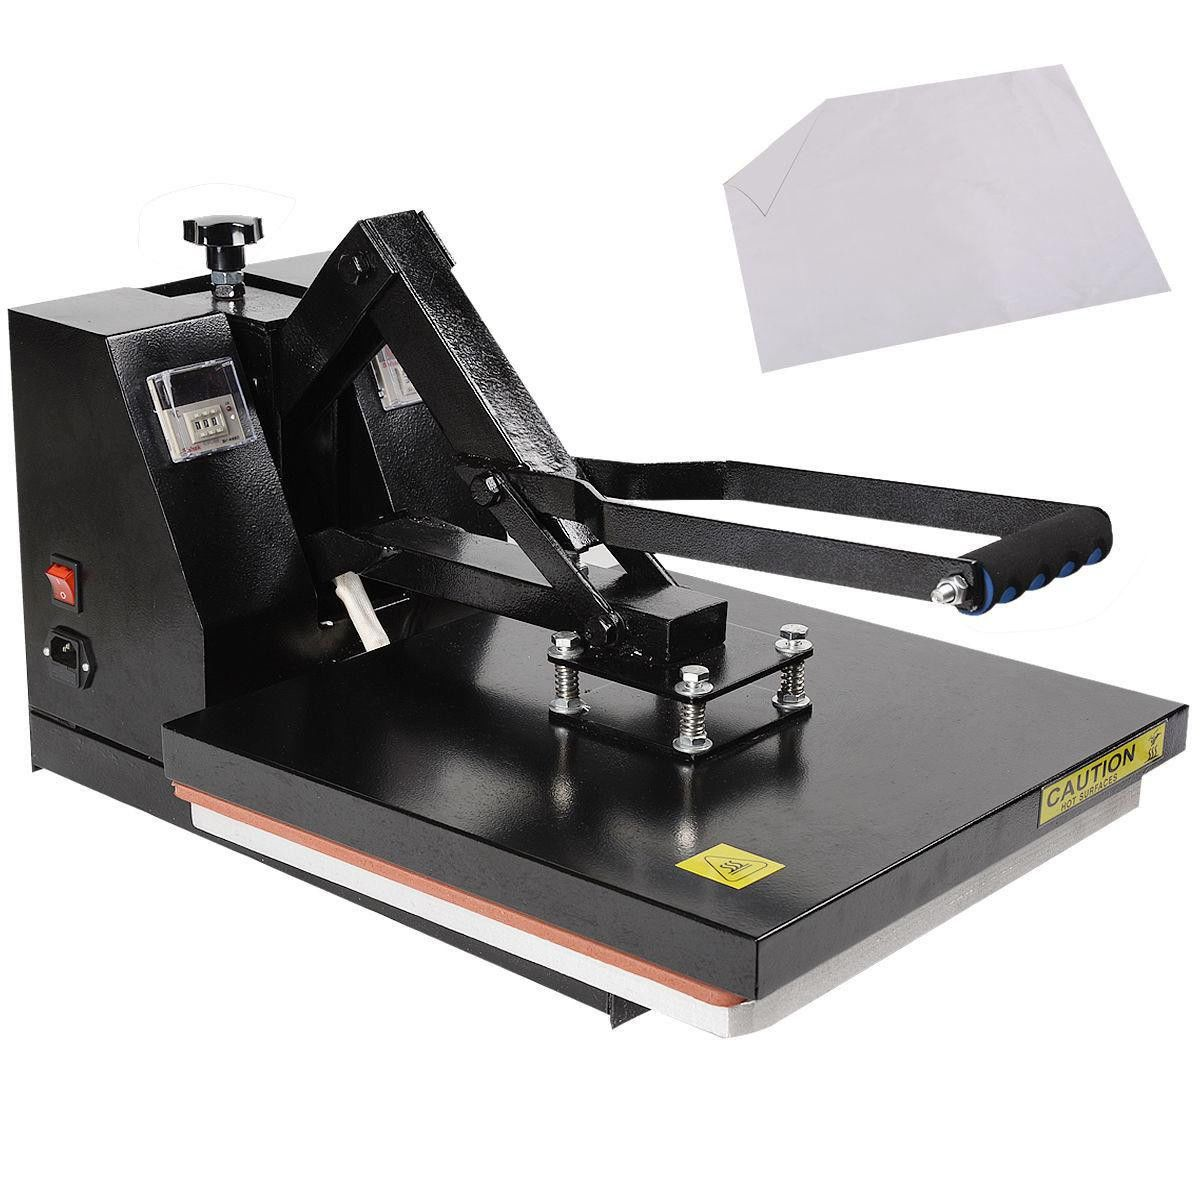 New Digital Clamshell Heat Press Transfer T Shirt Sublimation